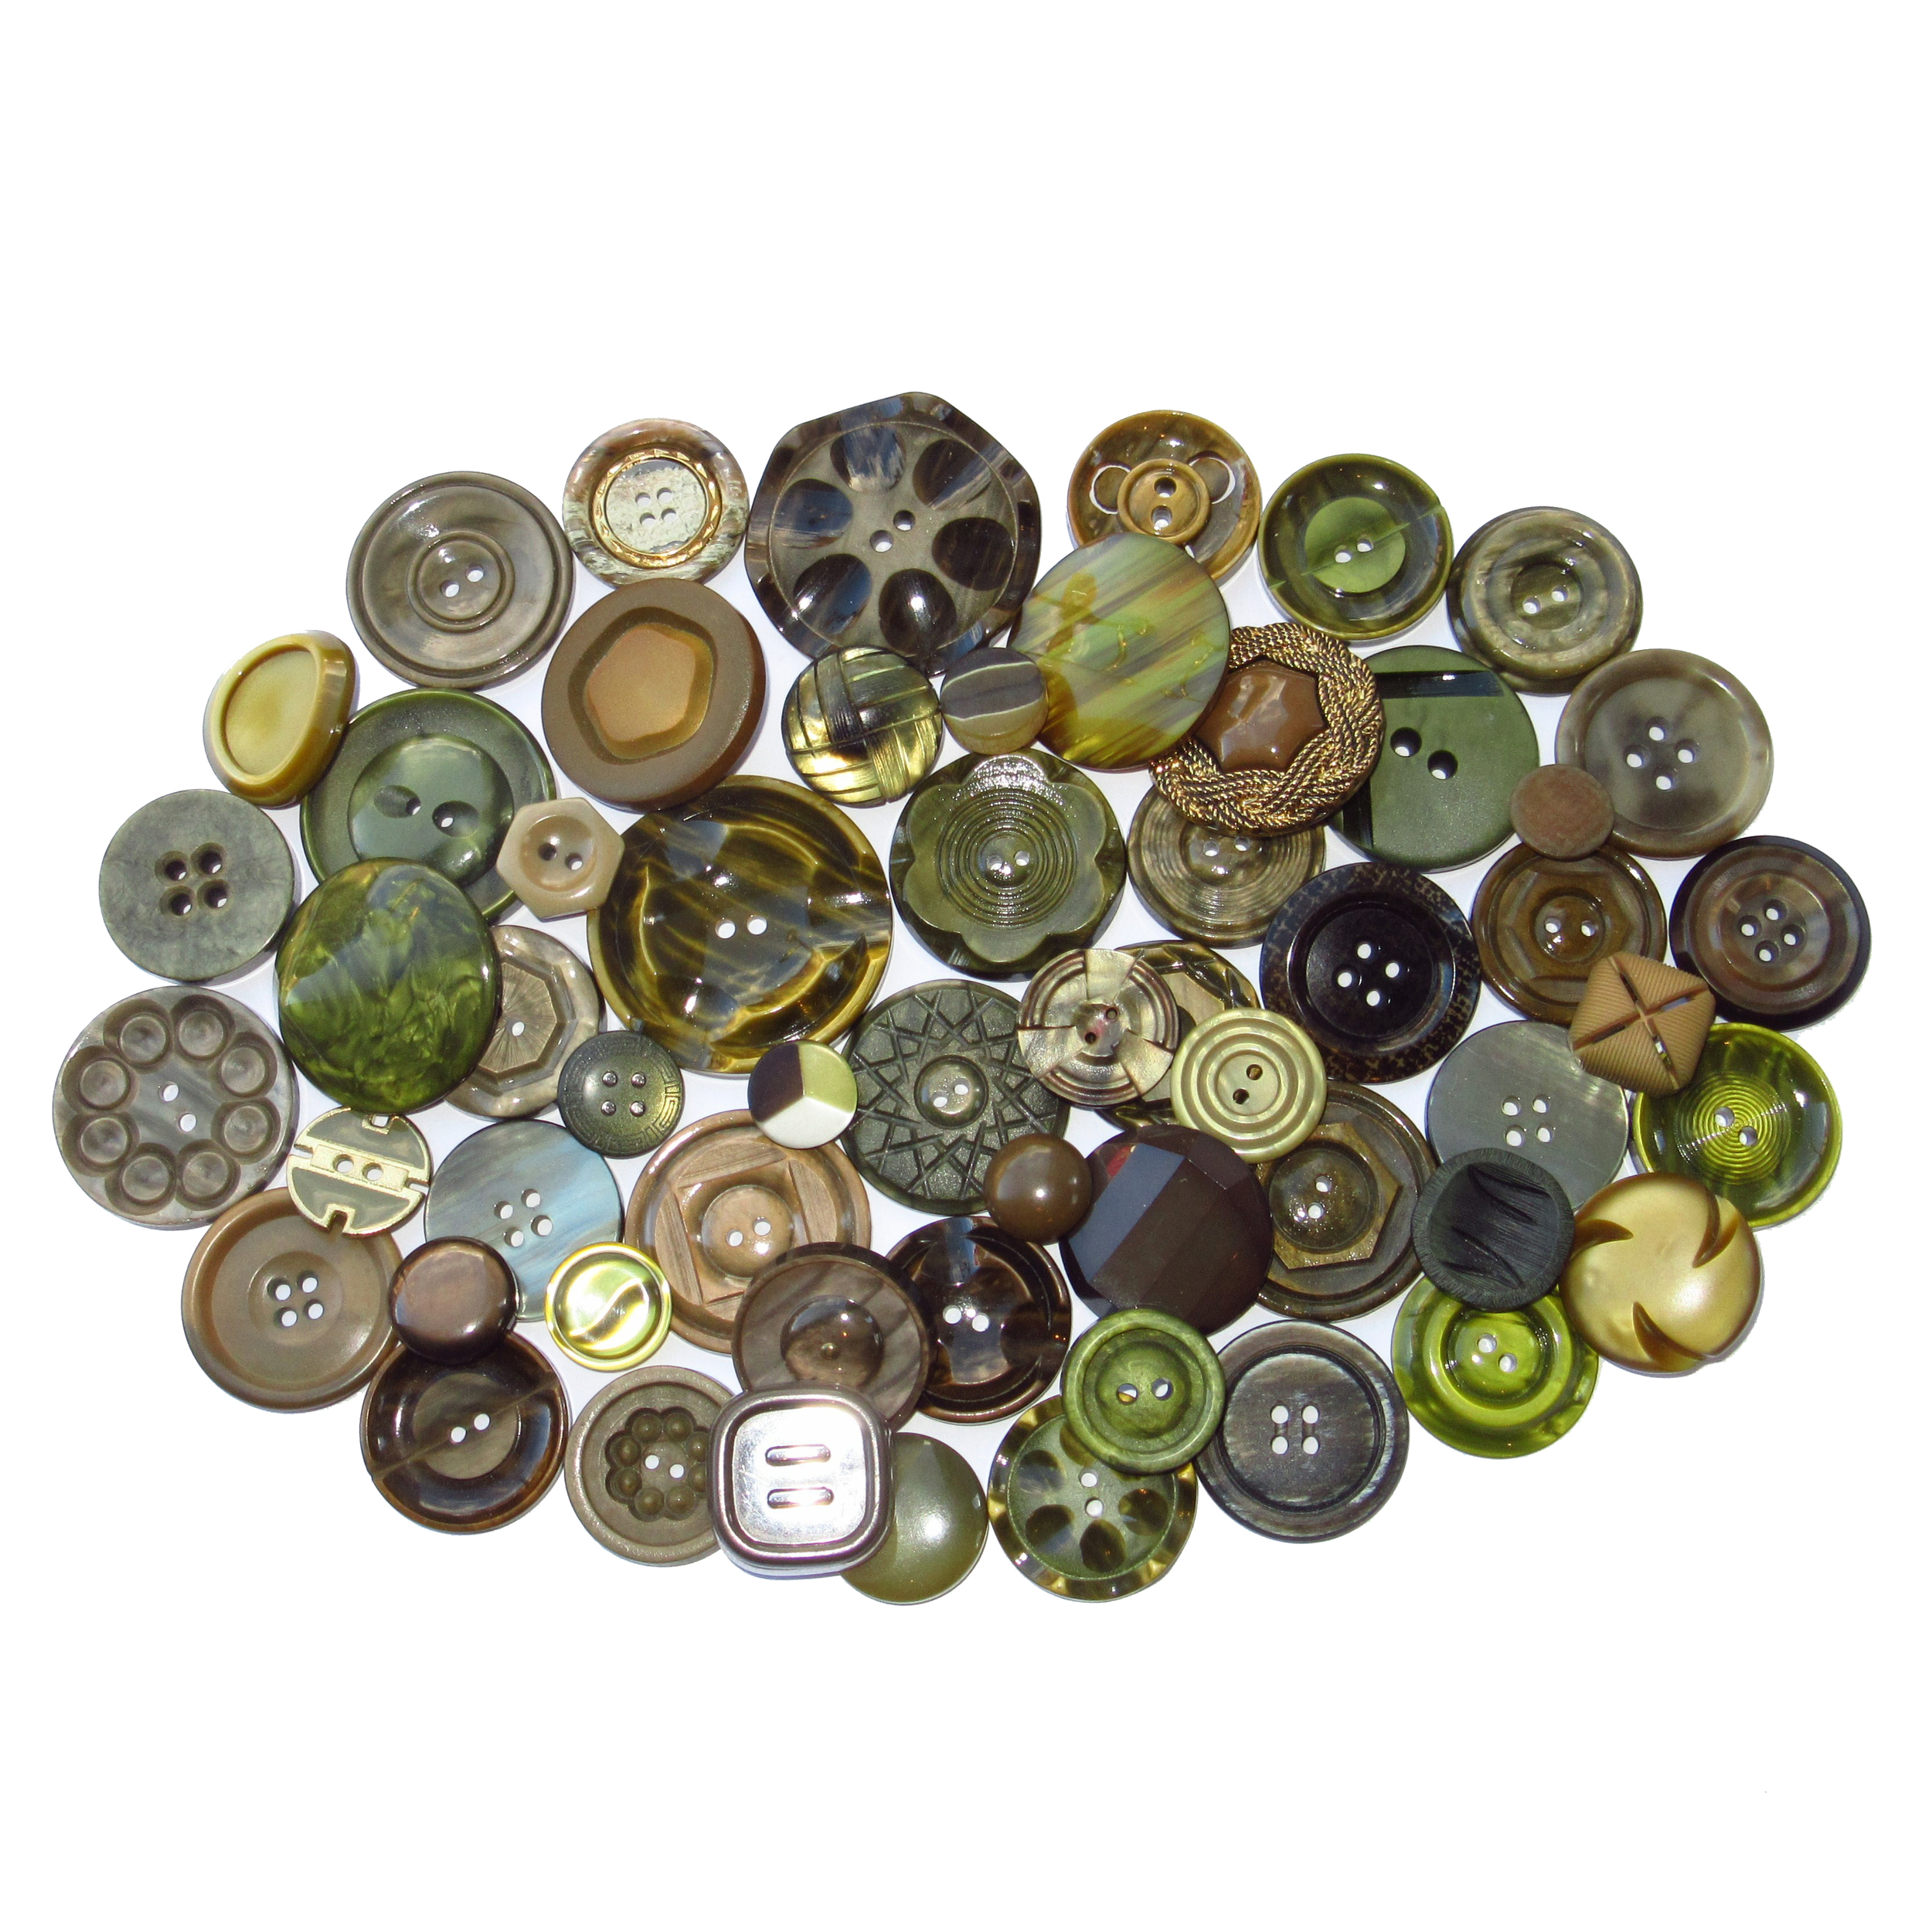 Kaki buttons